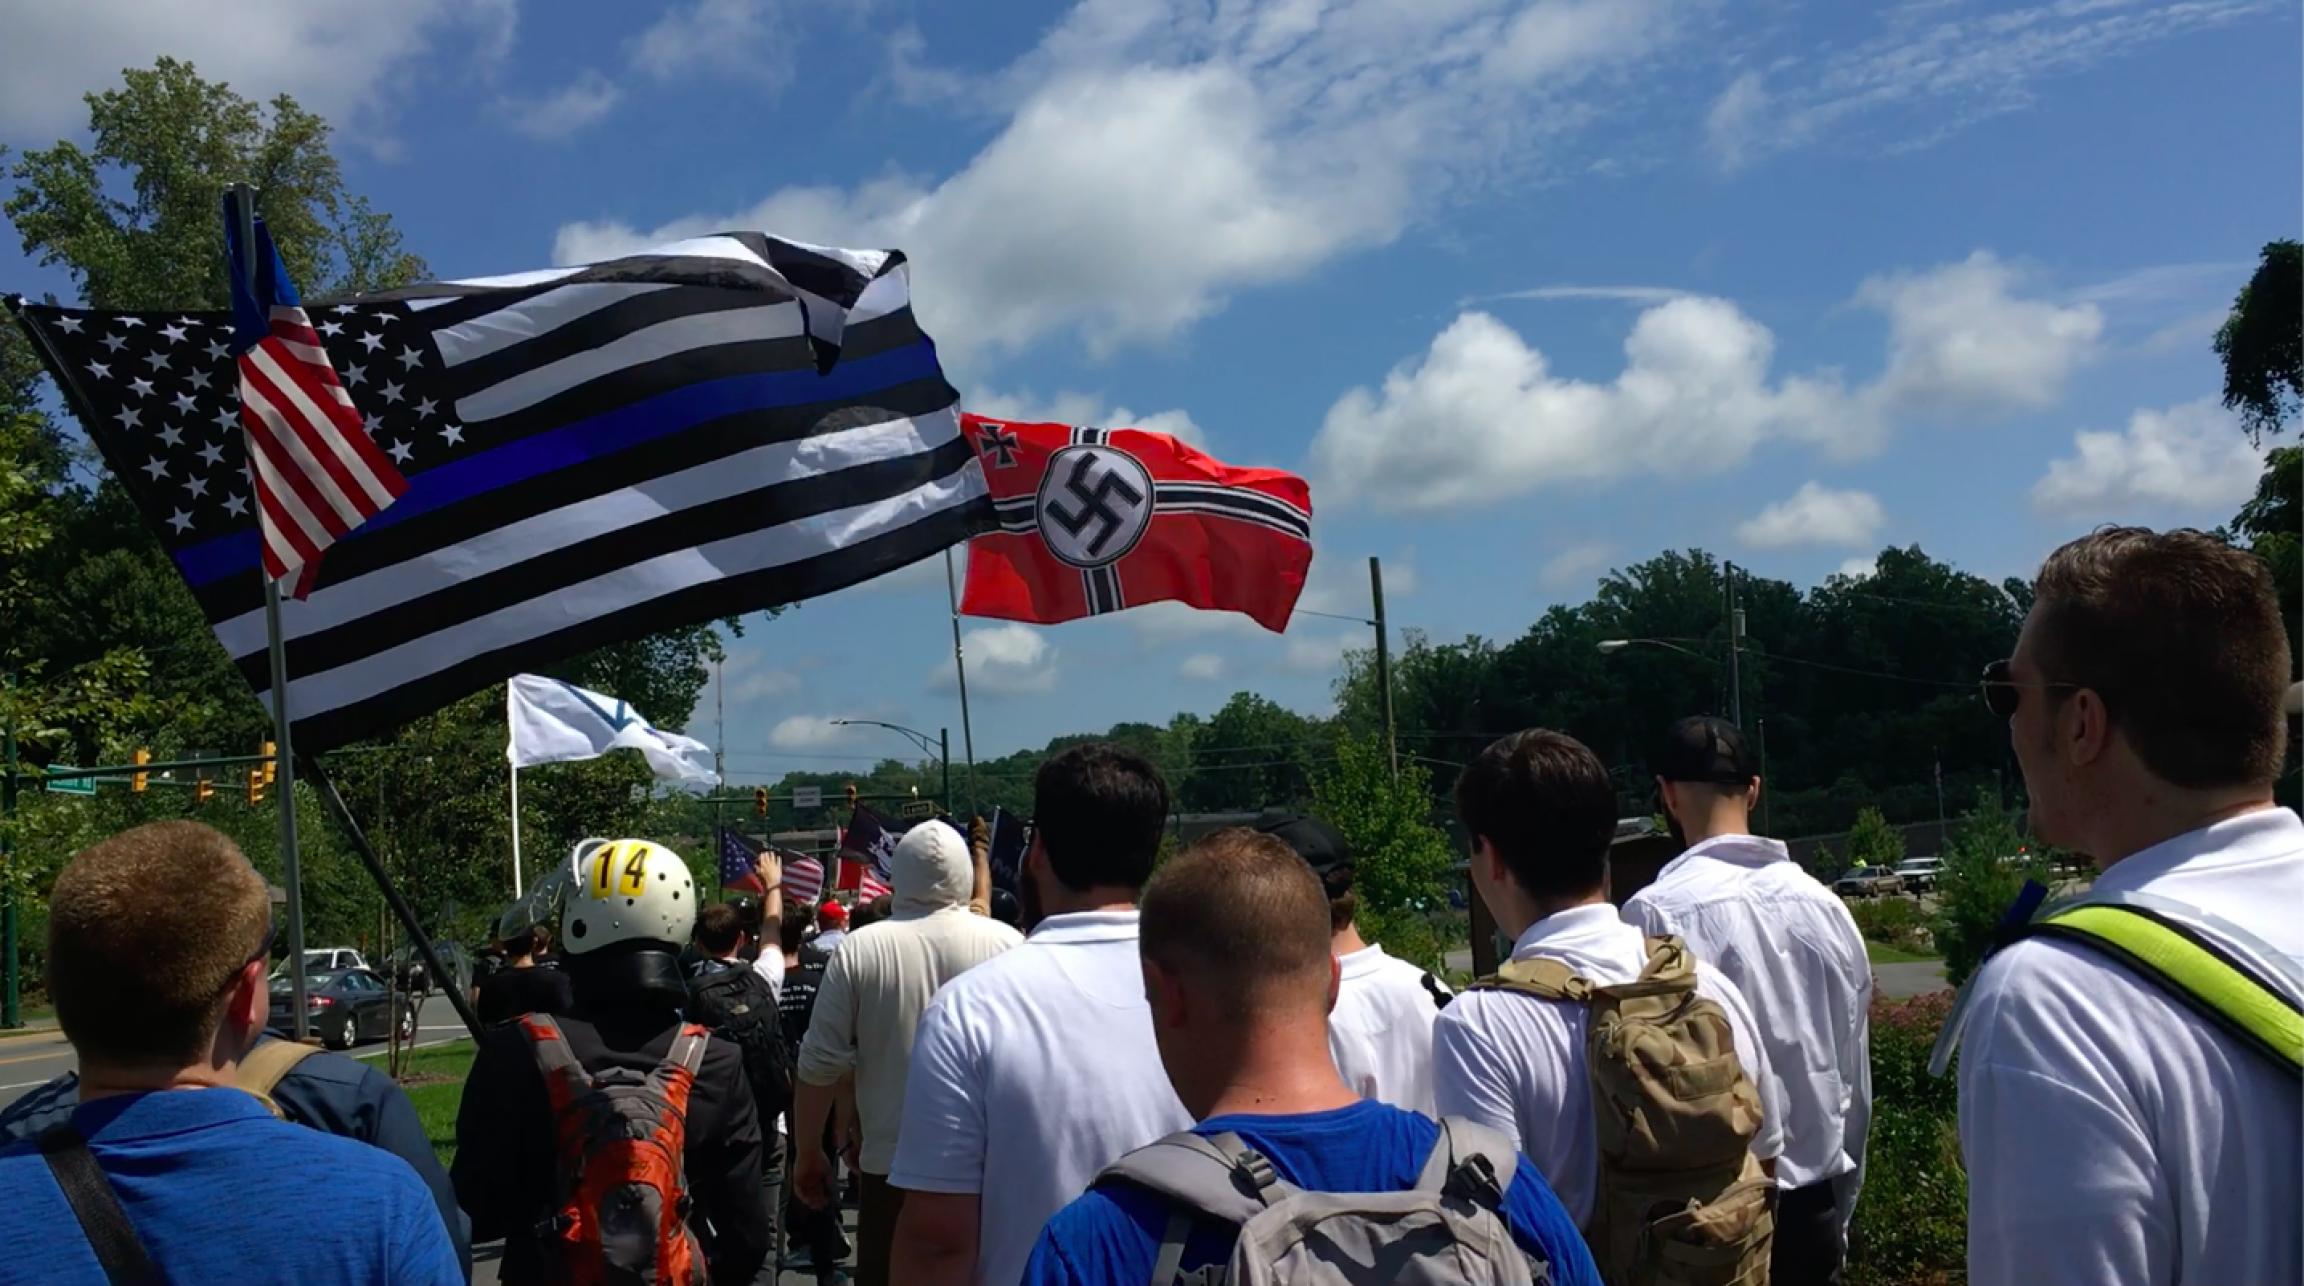 White men walk down a street with white power flags showing Nazi symbols